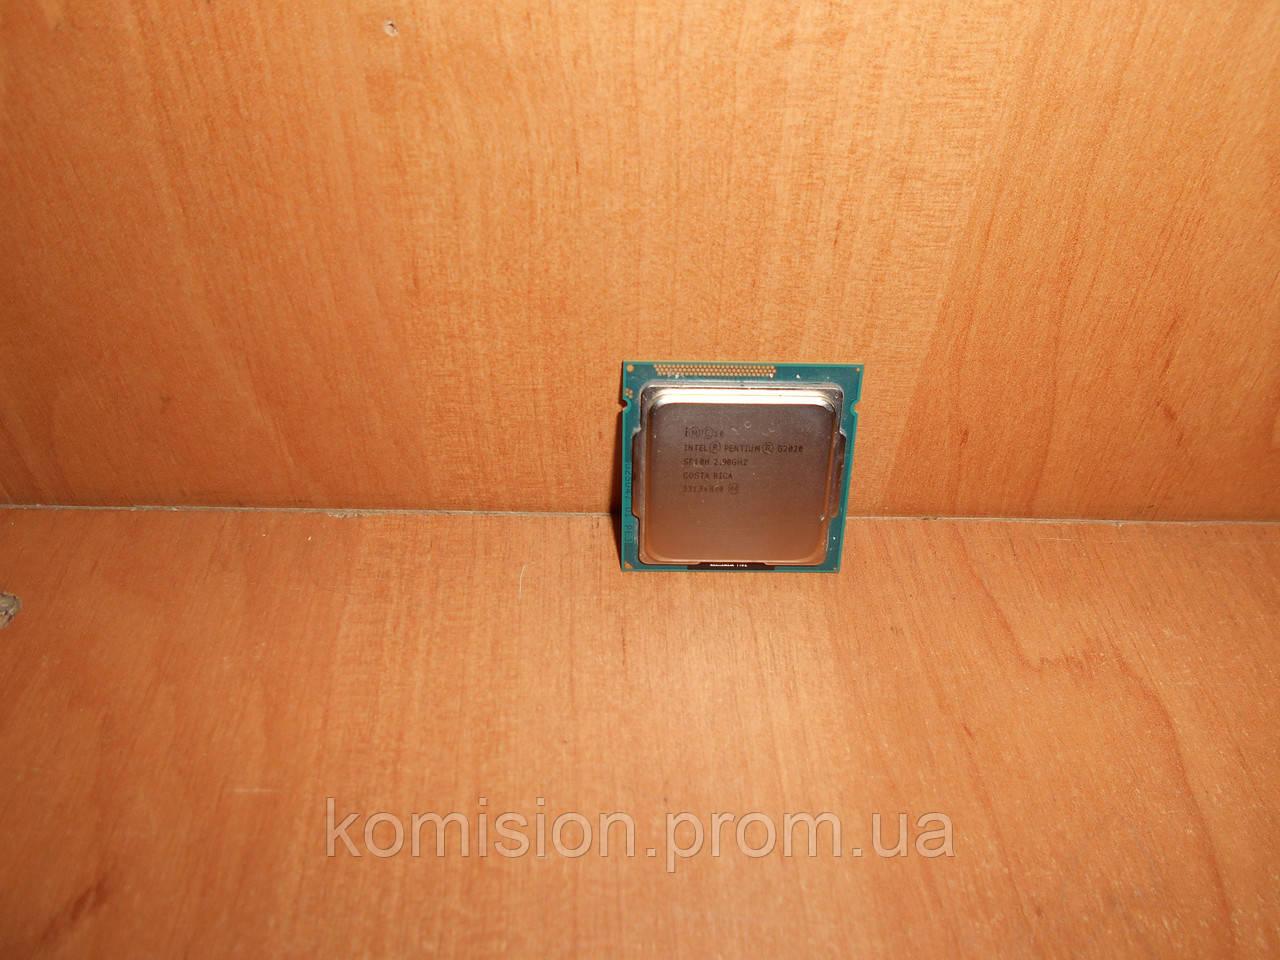 Процесор Intel Pentium G2020 2,9 GHz s1155